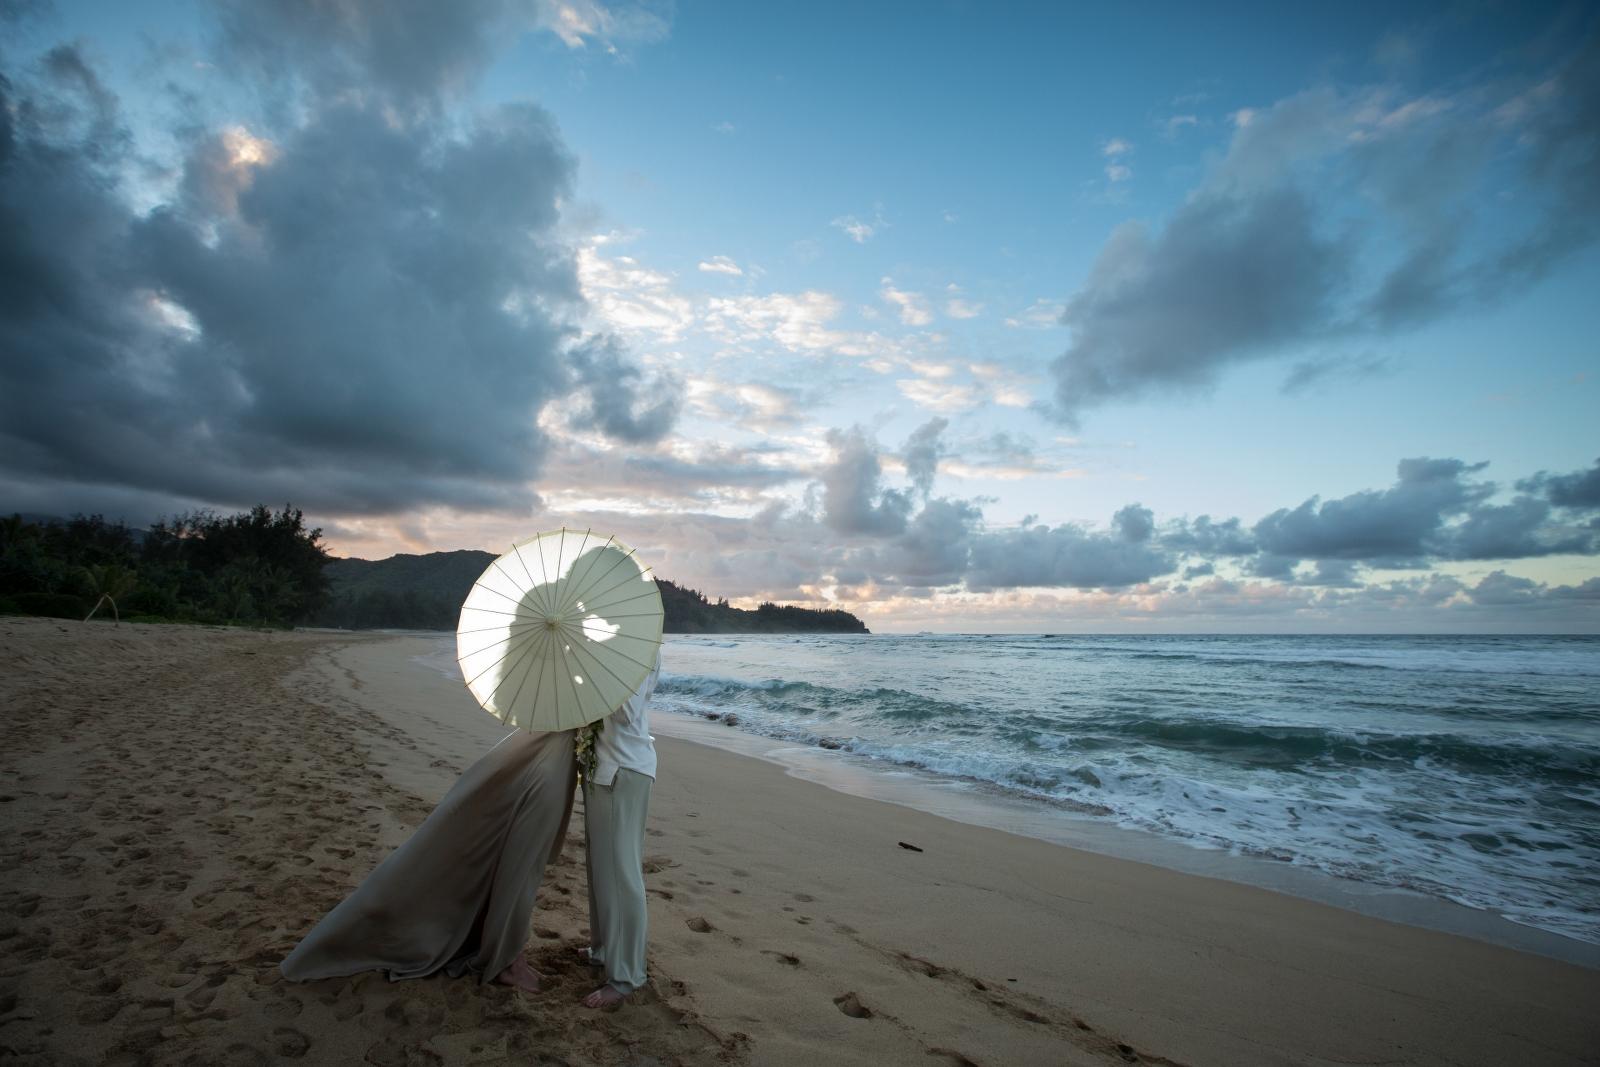 Sunset wedding shoot with backlighting and umbrellas!